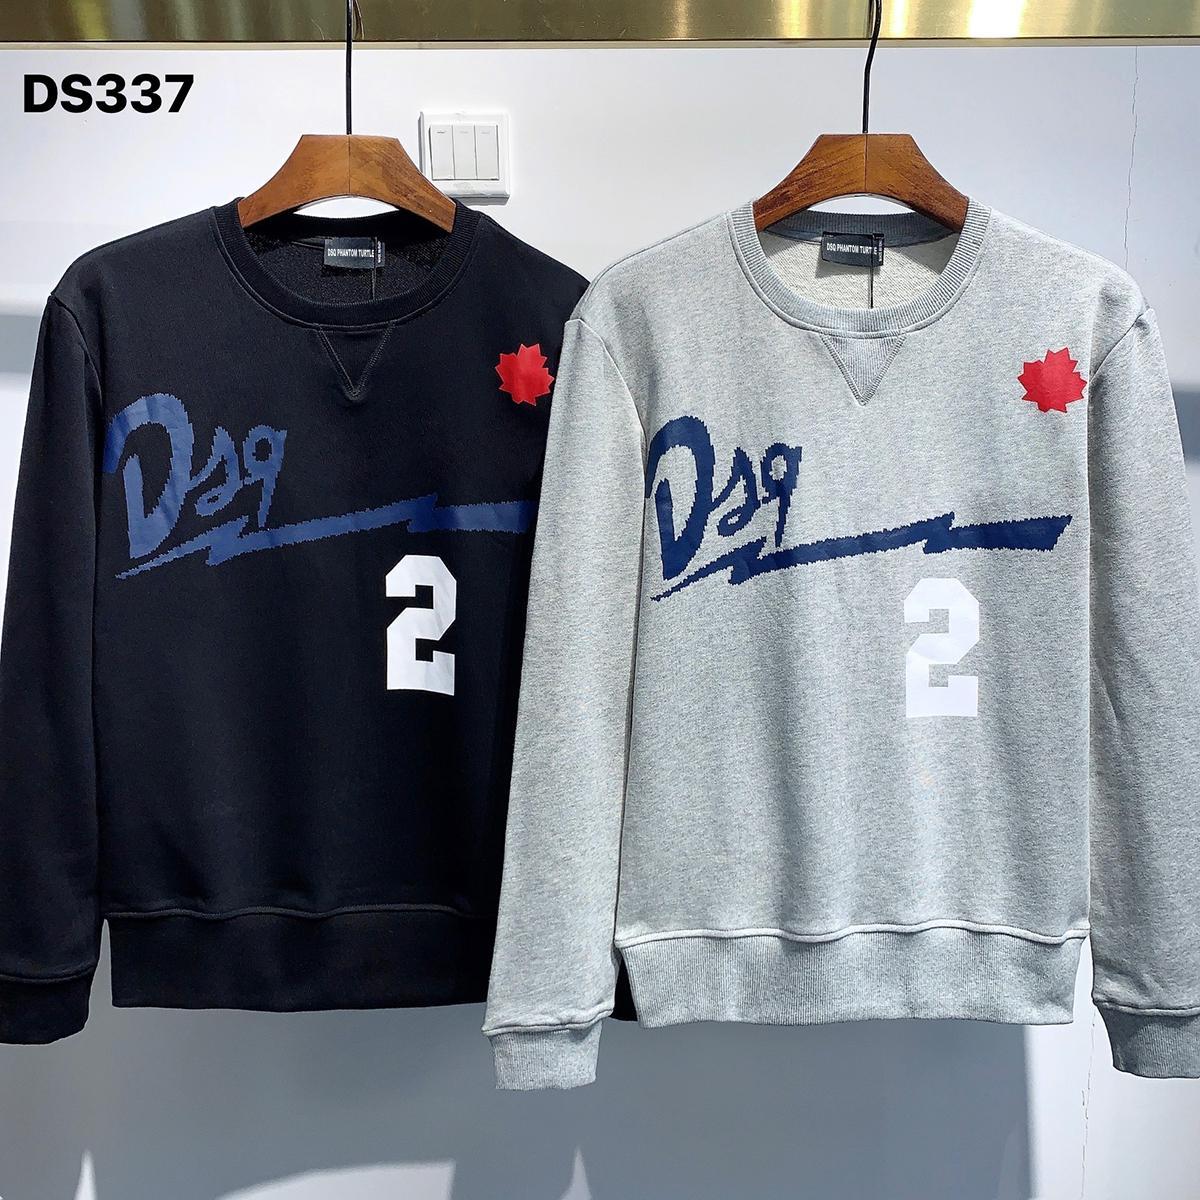 DSQ Phantom Turtle Hoody New Herren Designer Hoodies Italien Mode Sweatshirts Herbst Druck DSQ Hoodie Männliche Top Qualität 100% Baumwolle Tops 01207